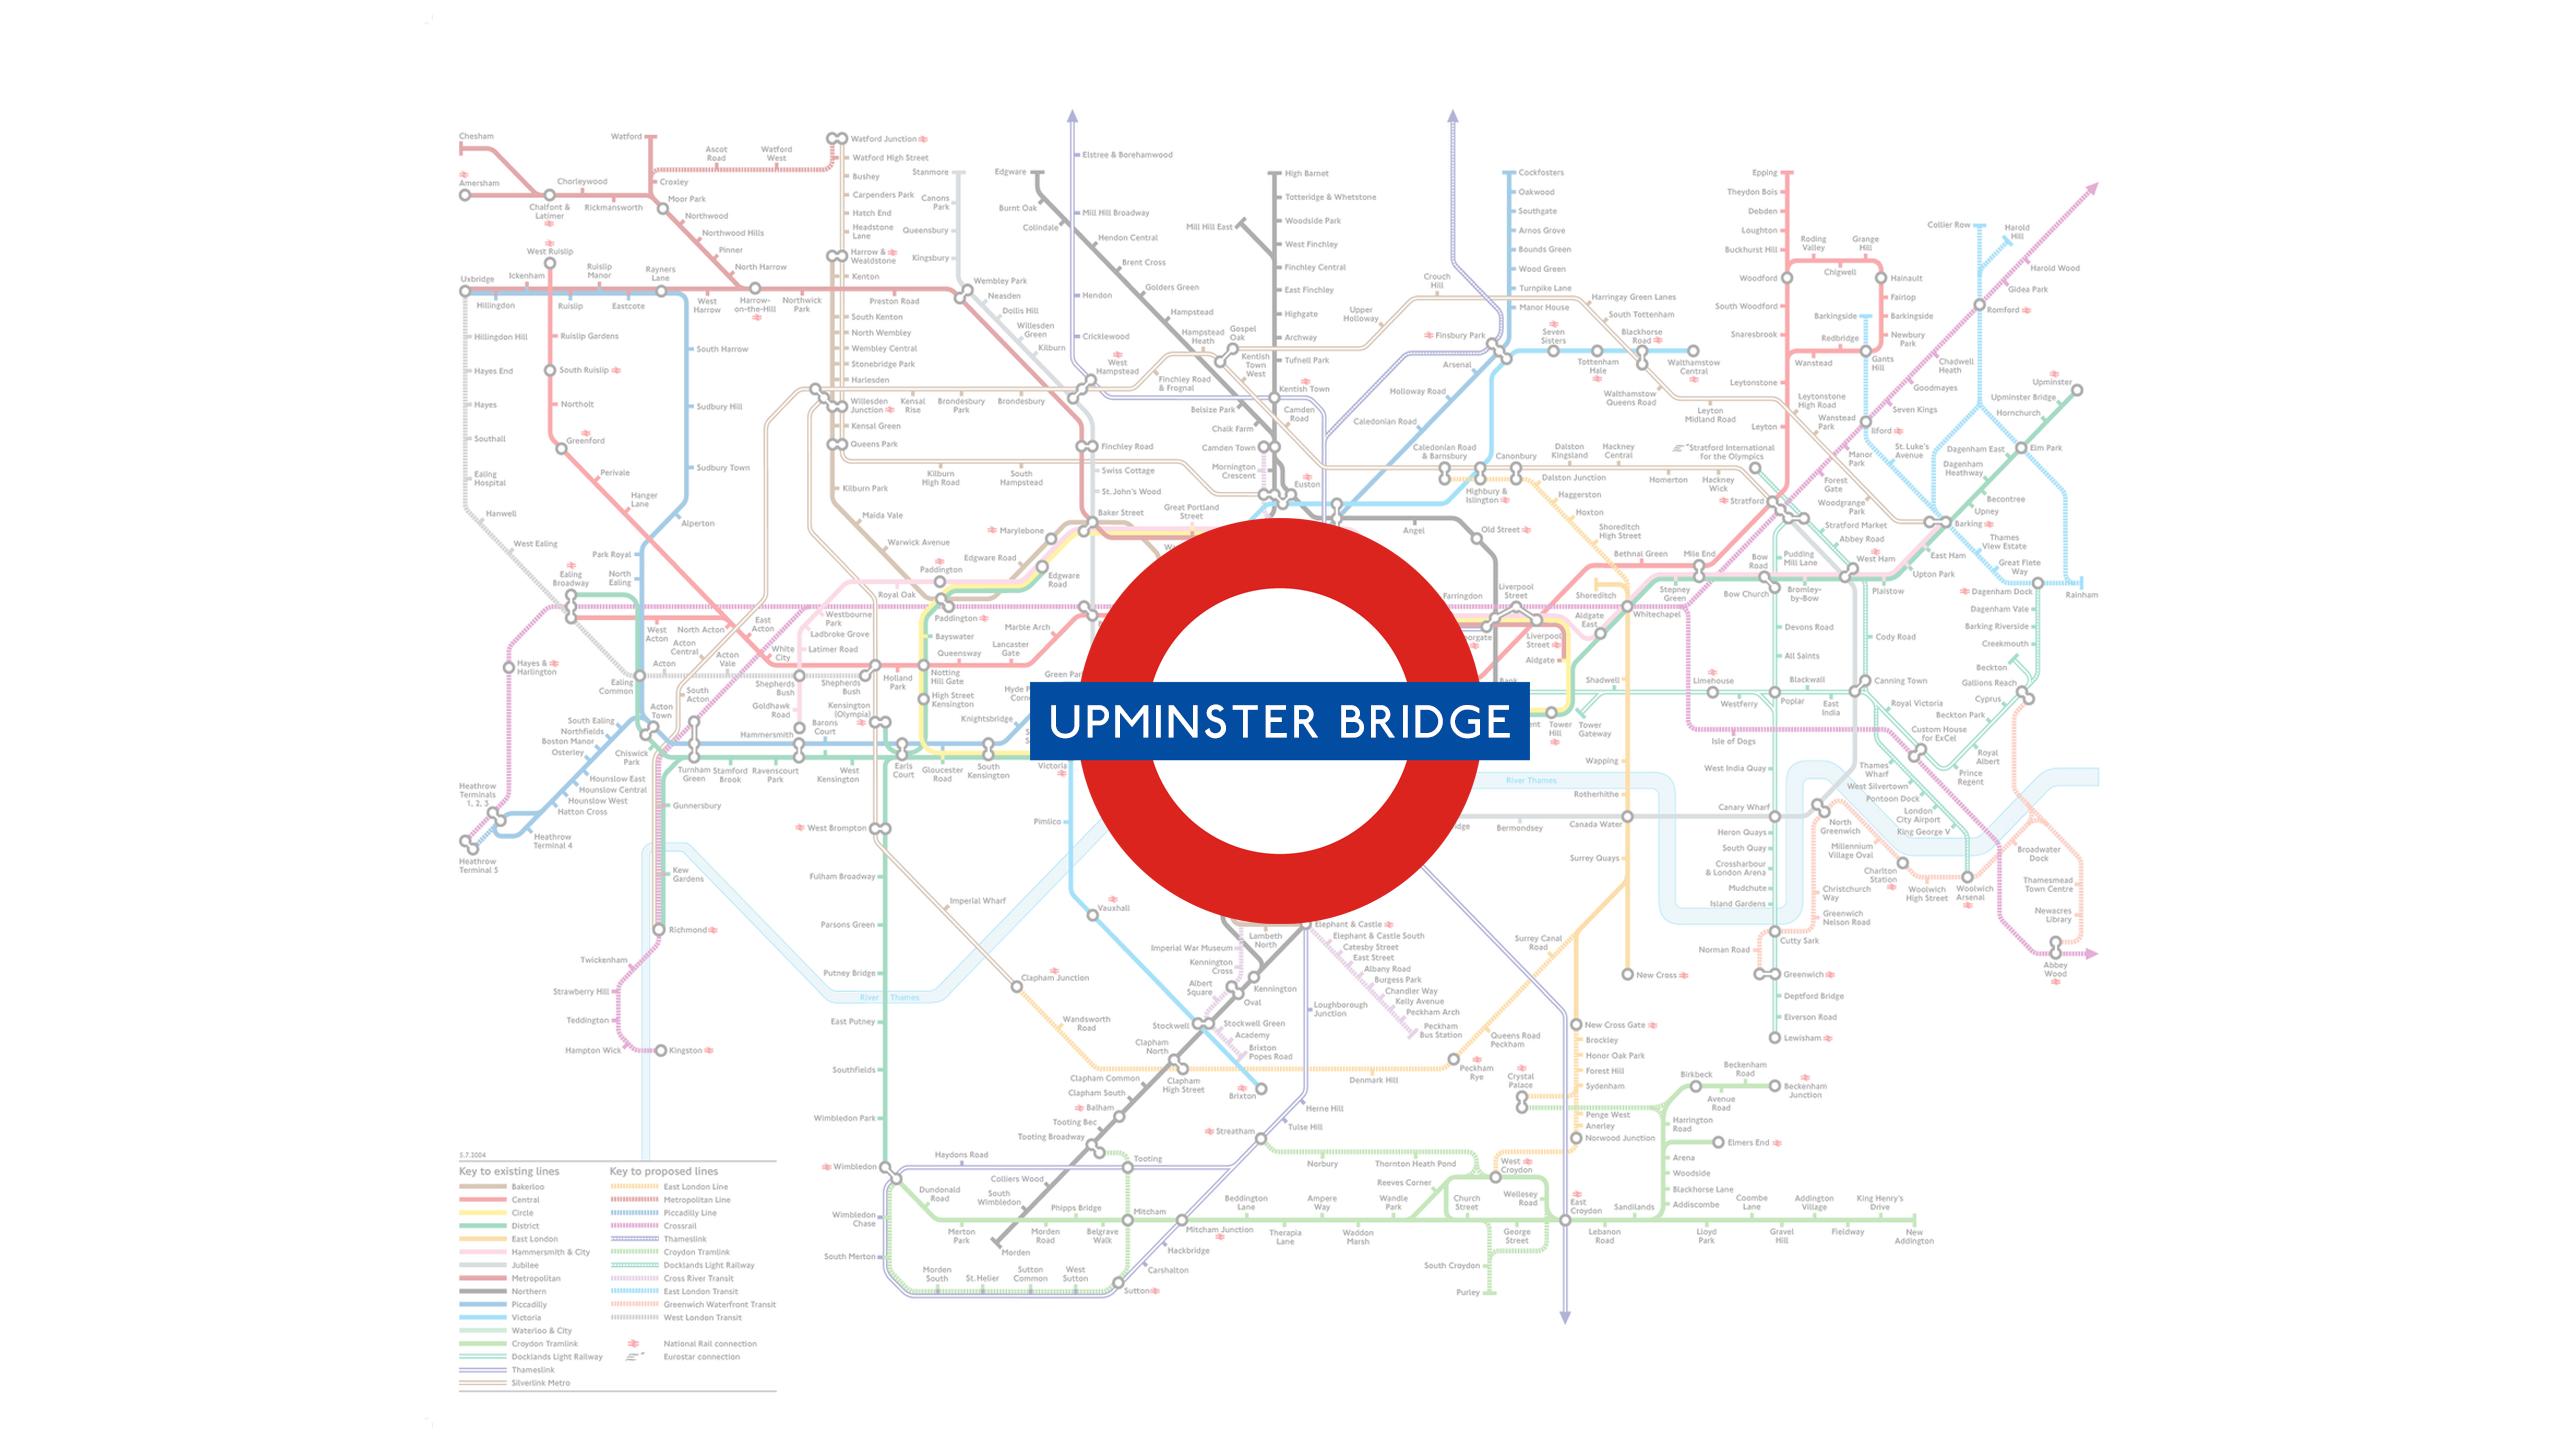 Upminster Bridge (Map)